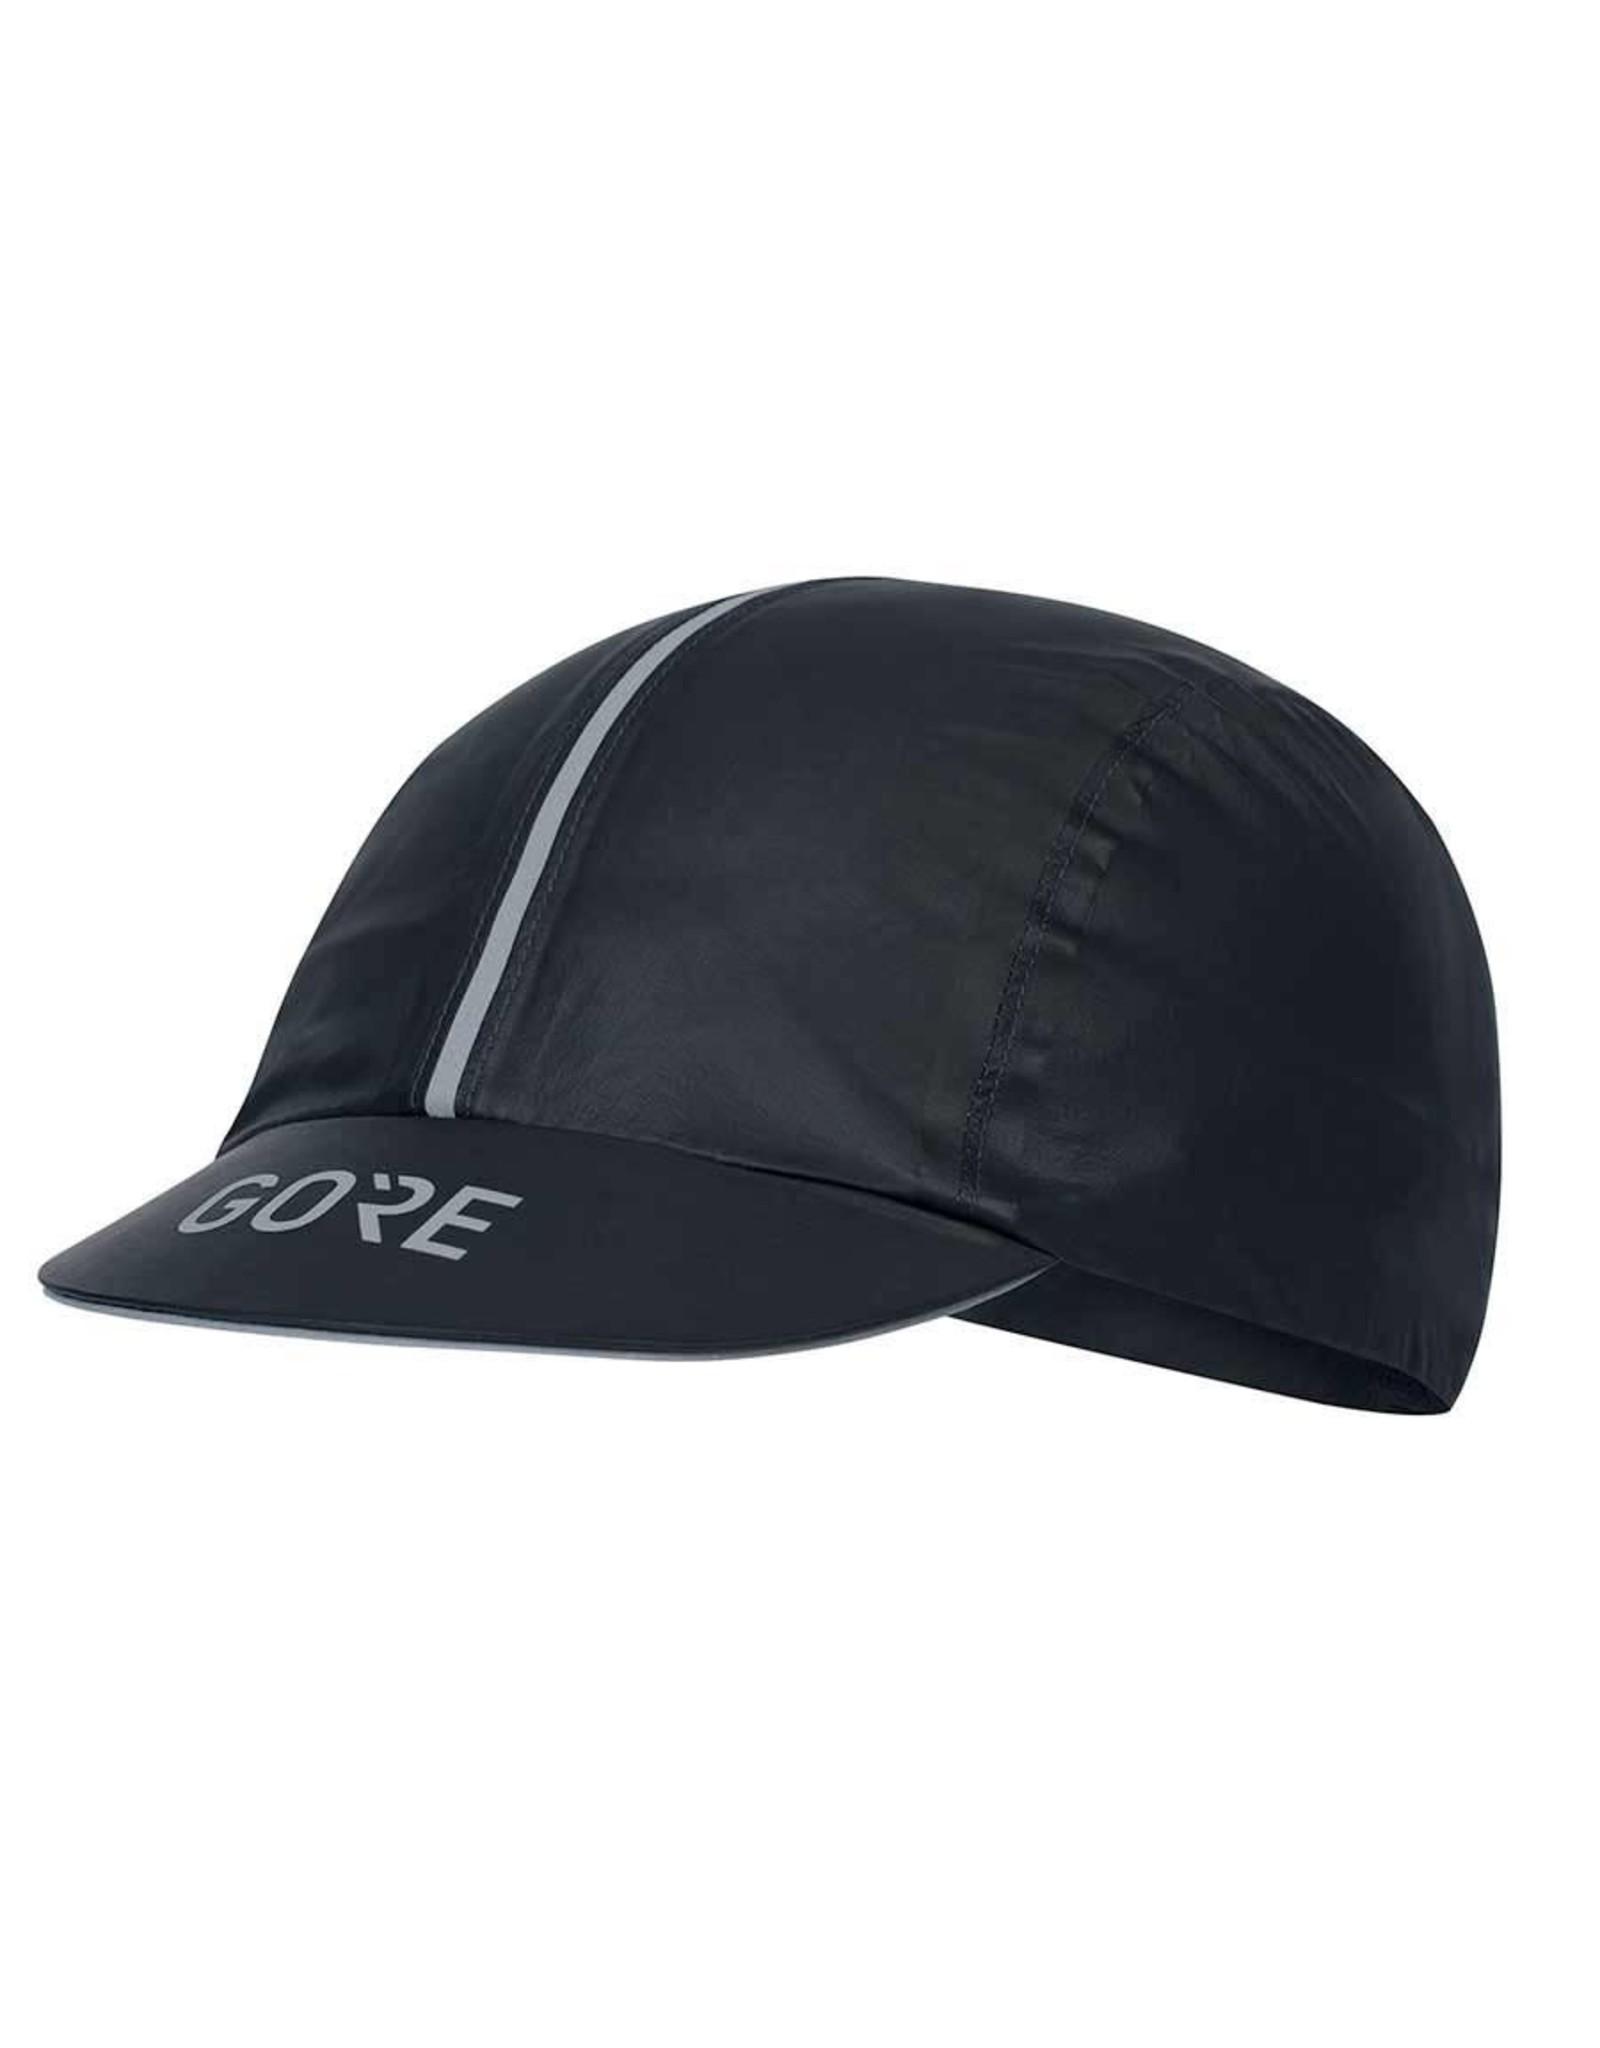 Gore Wear Gore Wear, C5 Gore-Tex Shakedry Cap, Black, U, 1003119900